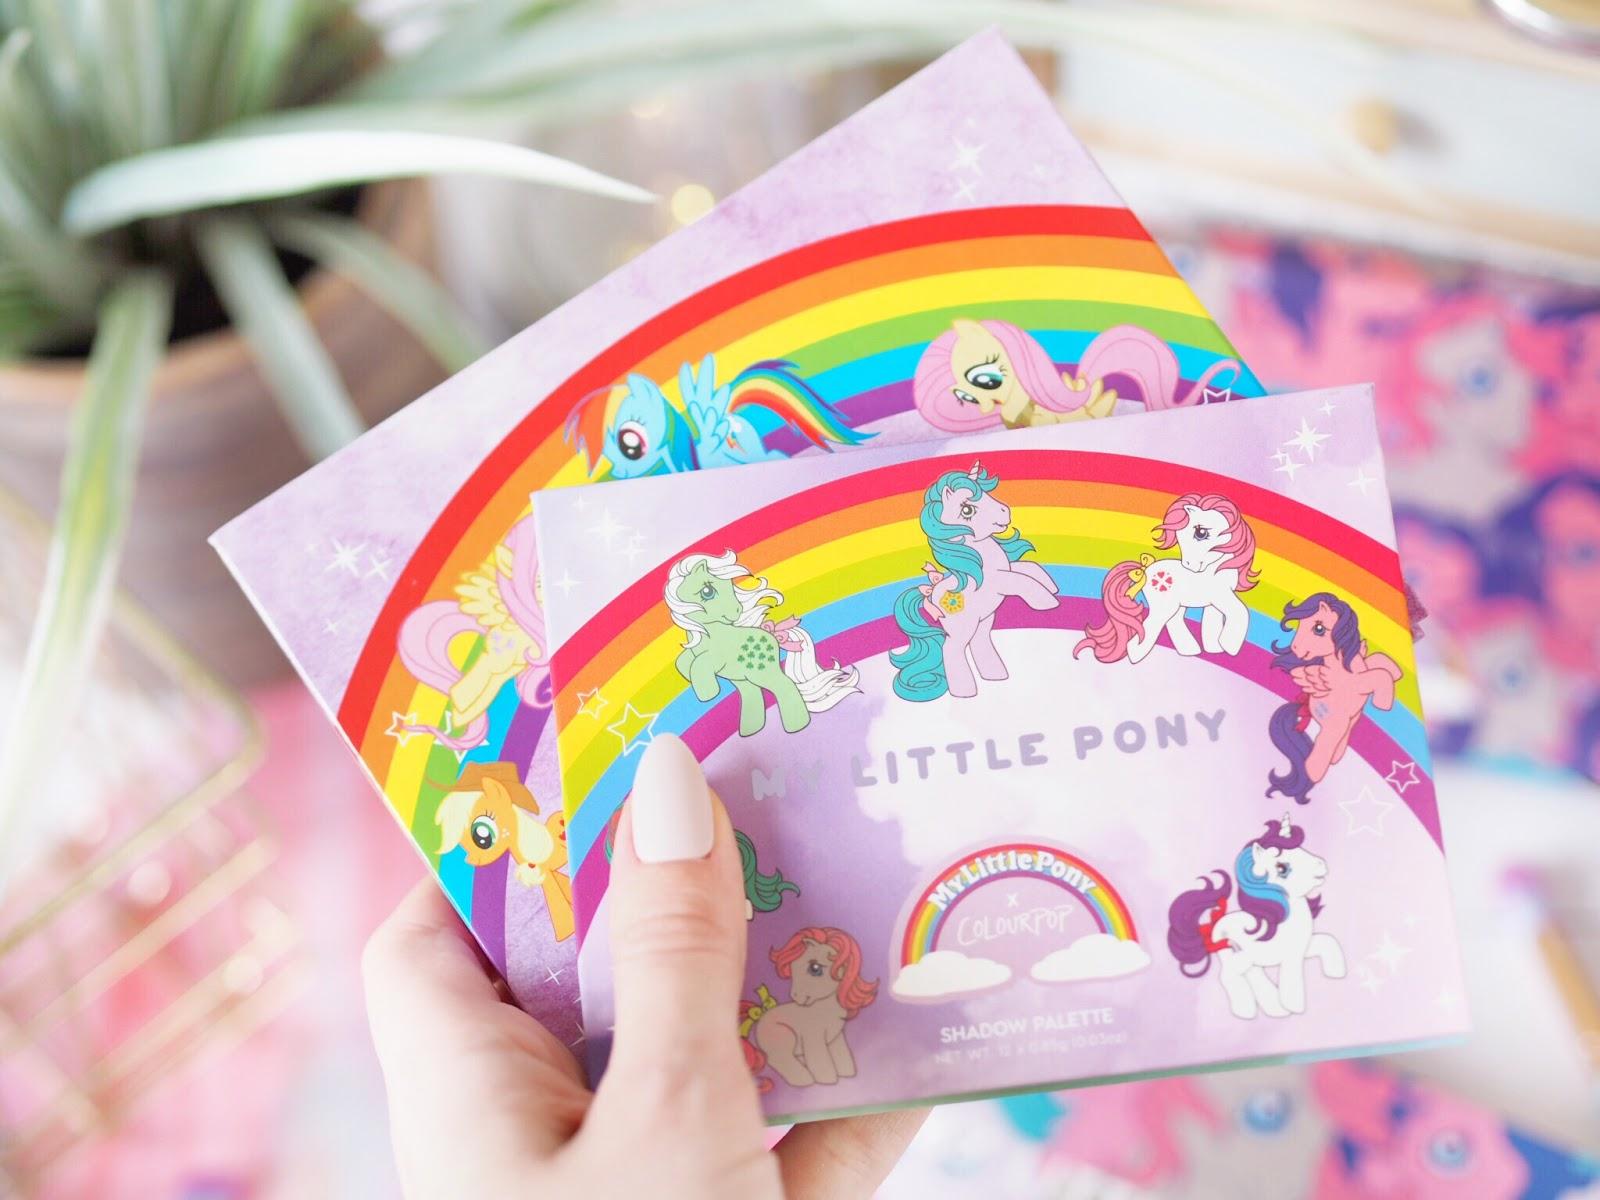 Colourpop My Little Pony Palette: Real vs FAKE! - Lady Writes